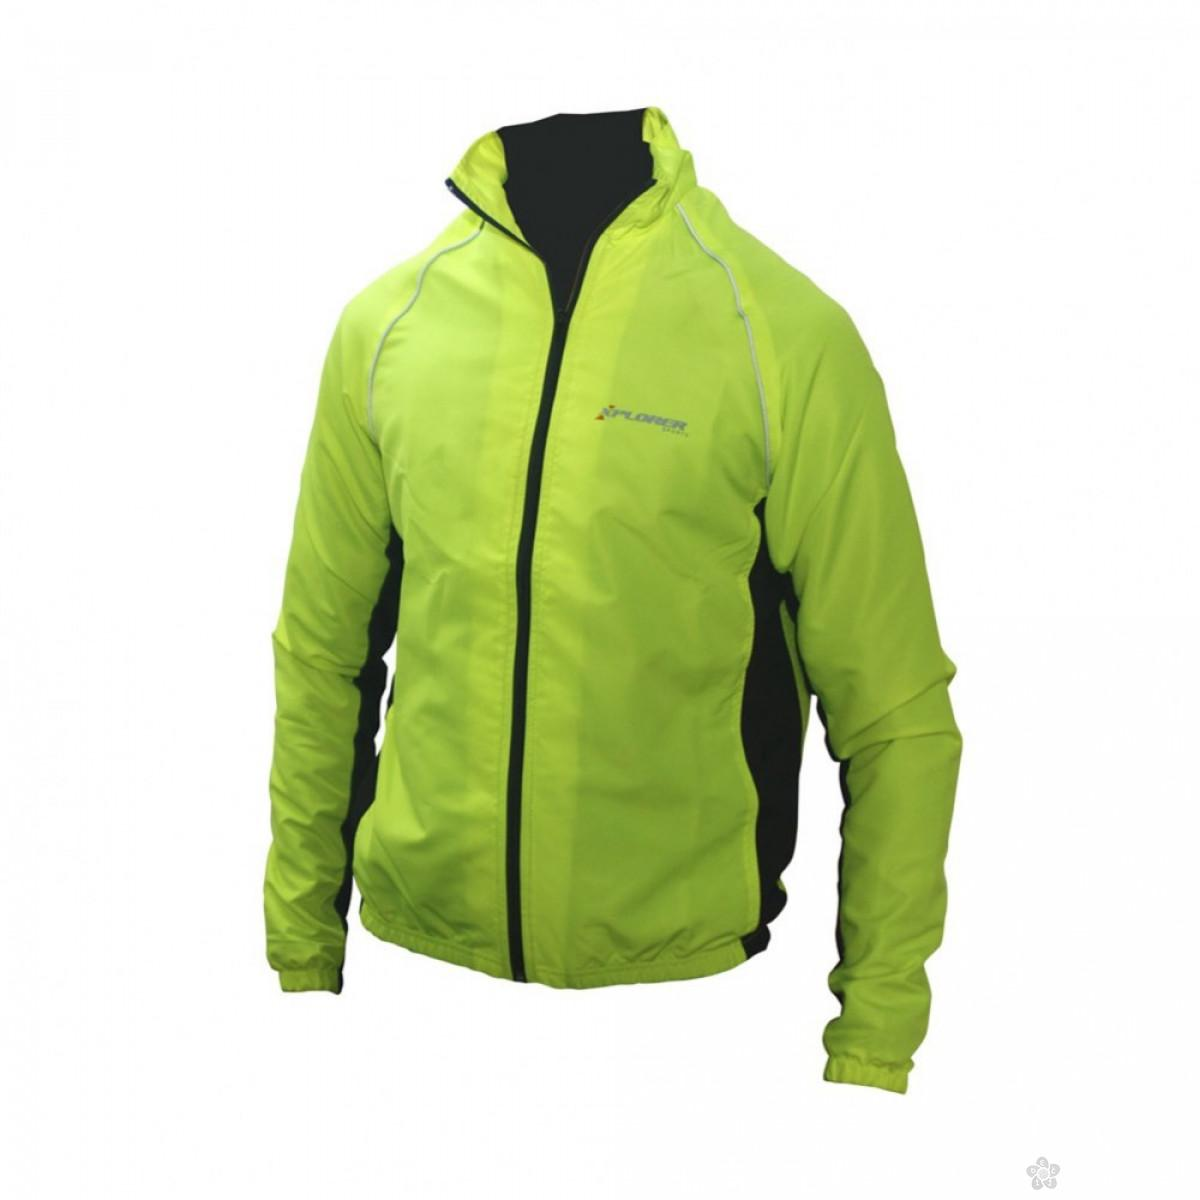 Biciklistička jakna Xplorer Scirocco vel. L